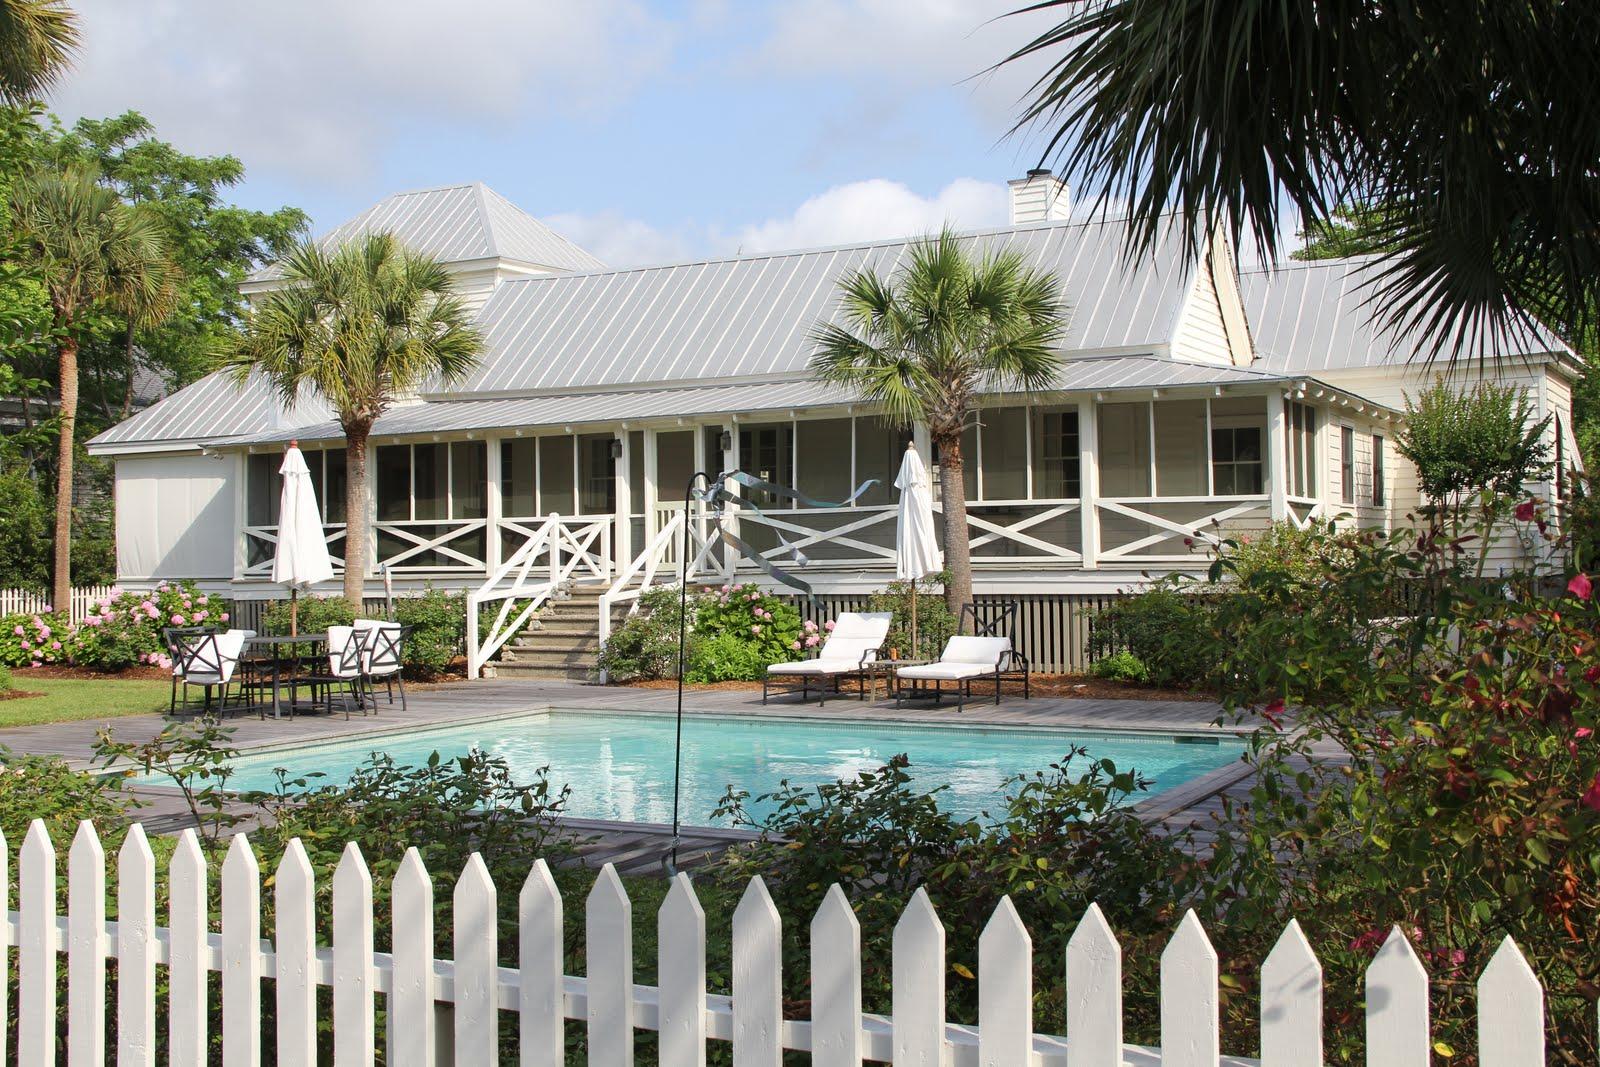 Jenny S Southern Comfort Beach House At Sullivans Island Sc